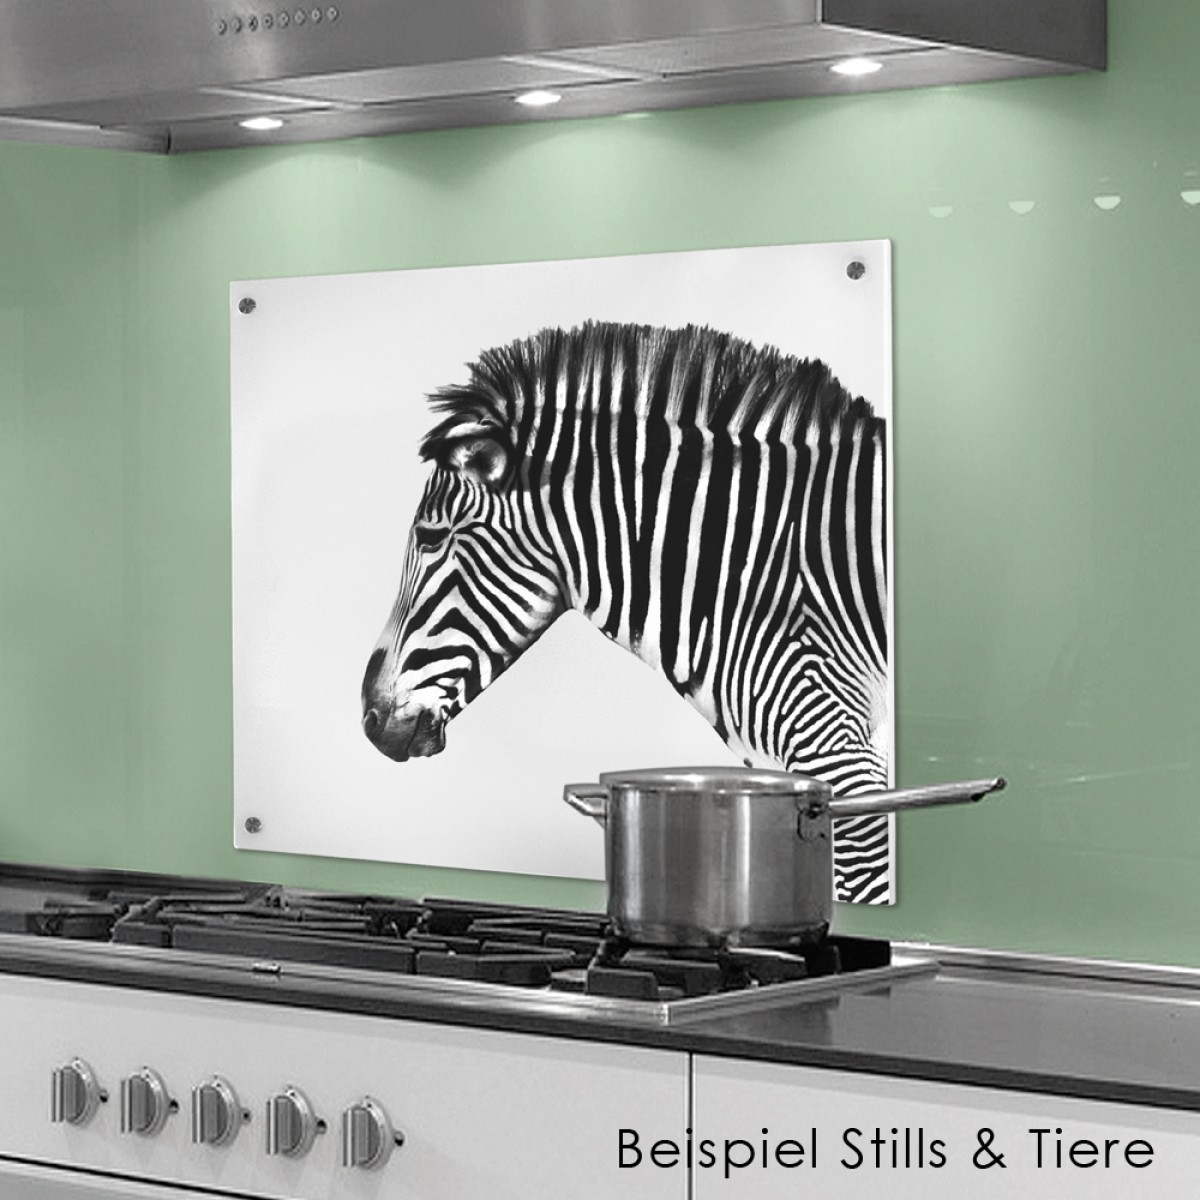 COGNOSCO Küchenrückwand 50x60 cm aus Glas - Hummer